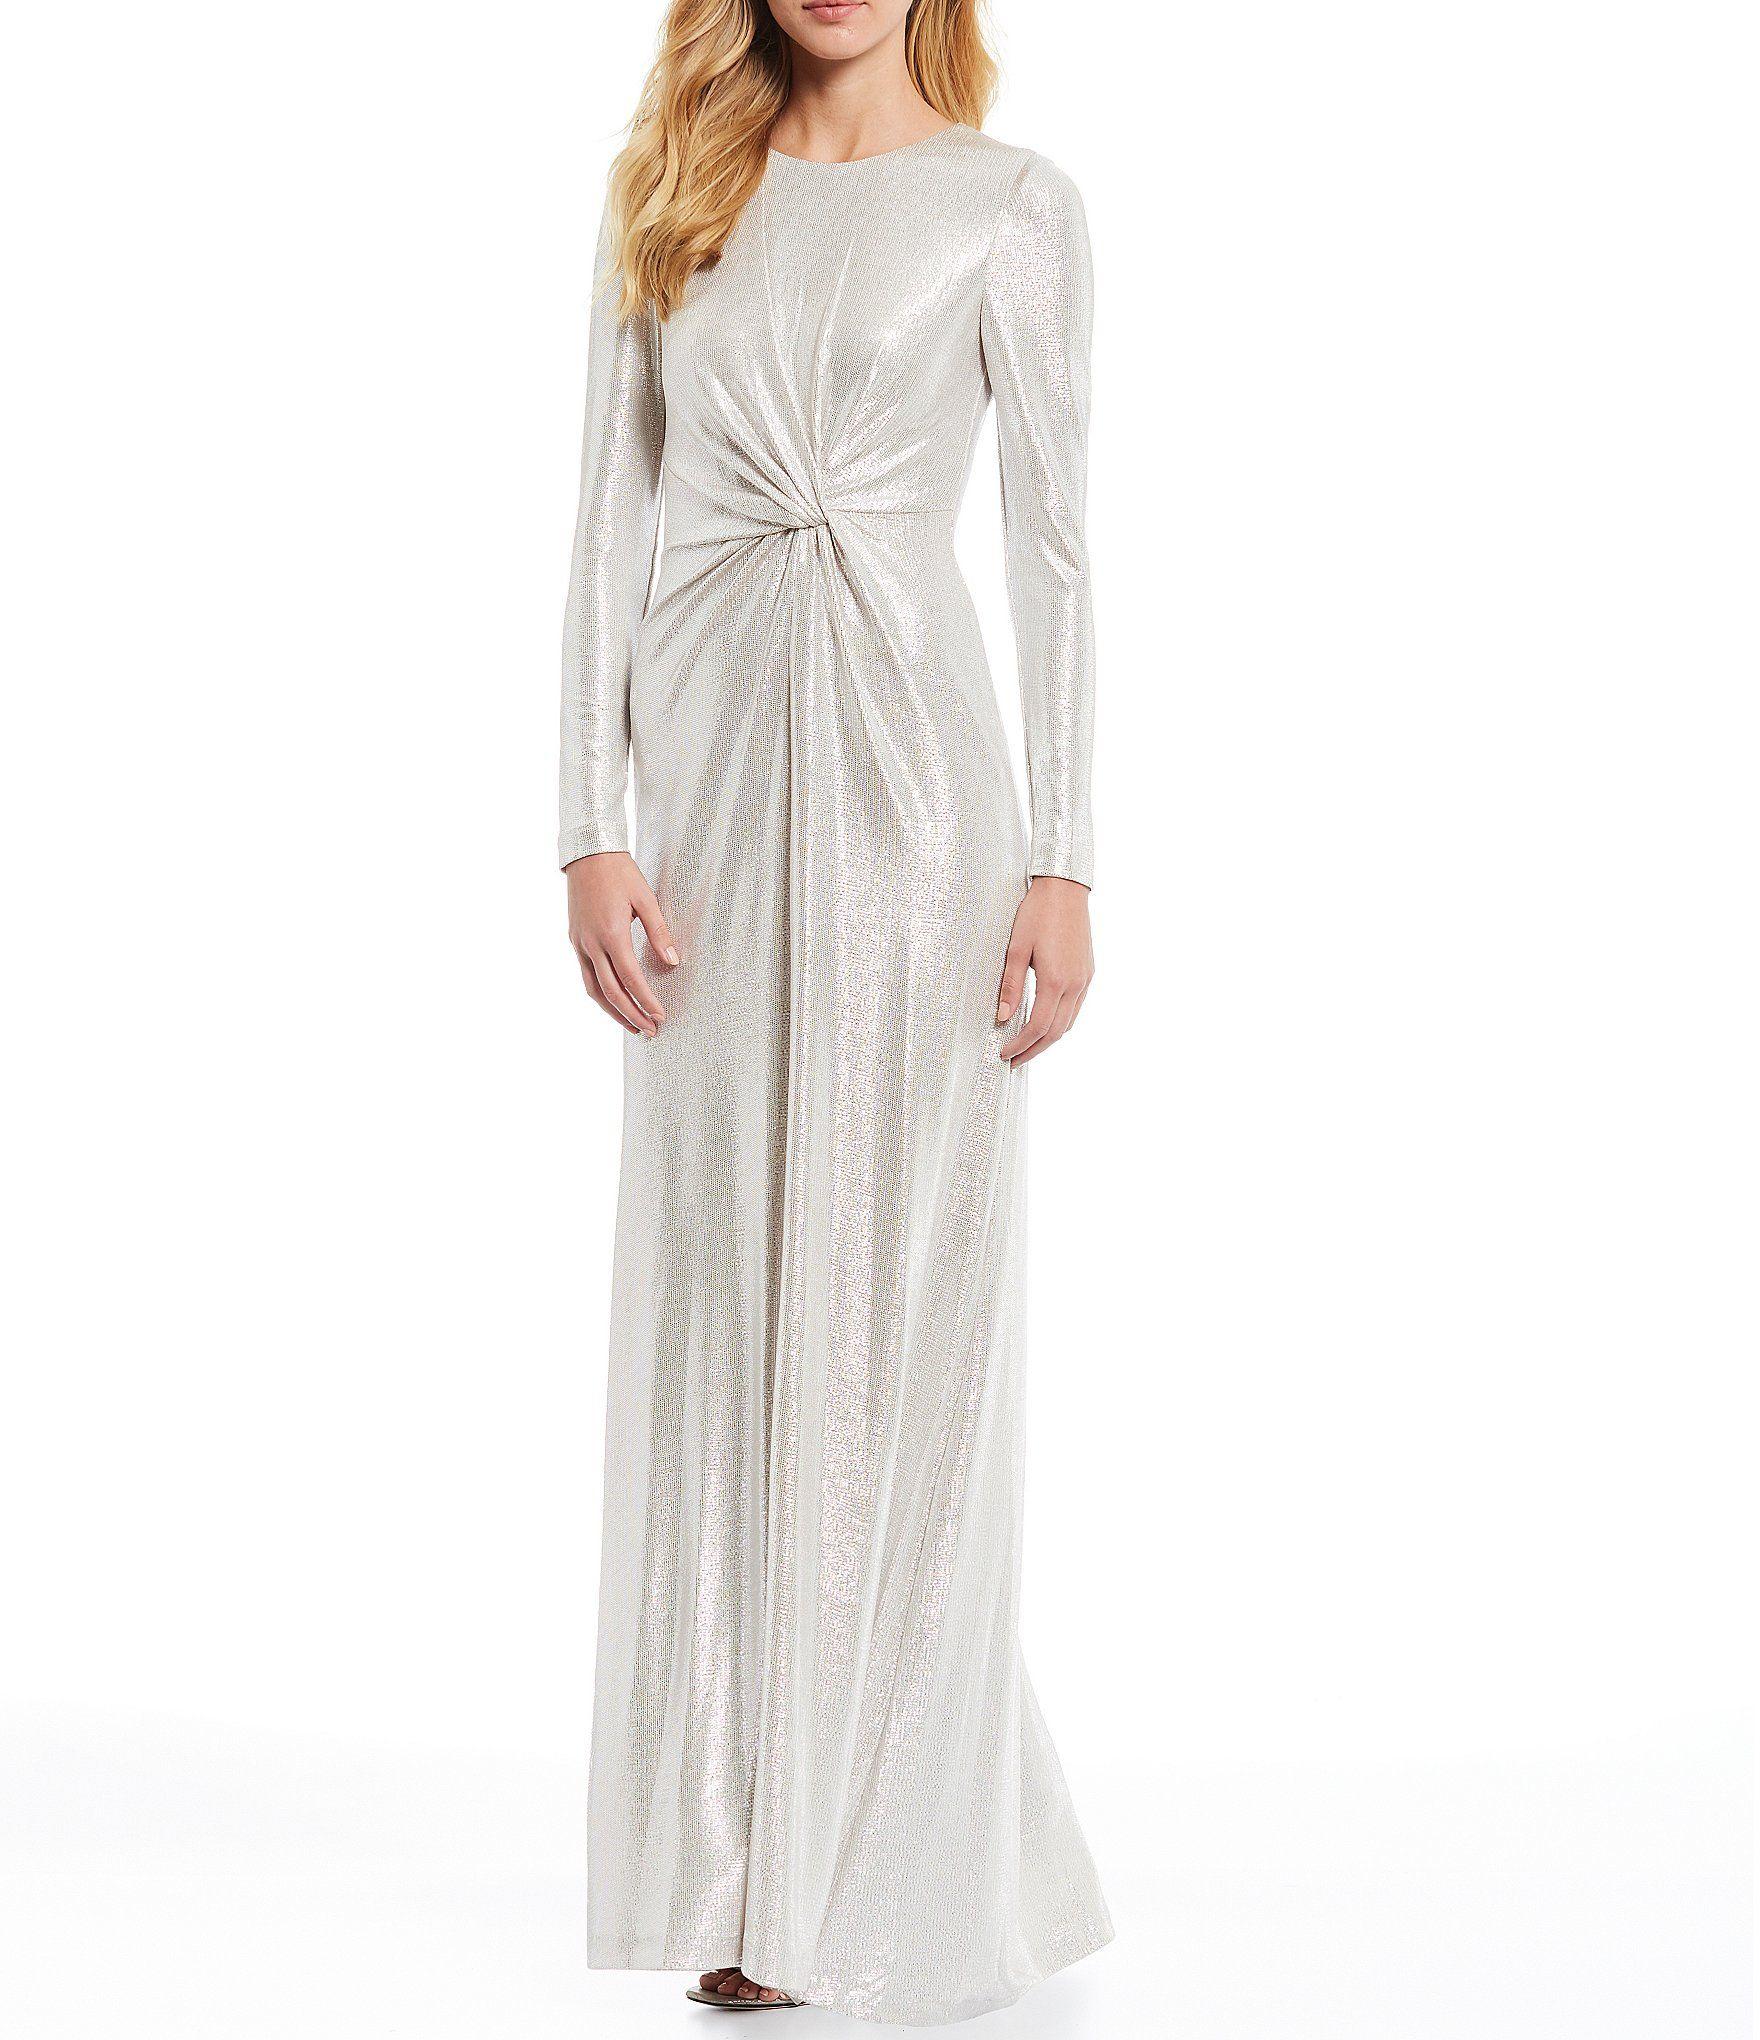 Eliza J Metallic Long Sleeve Knot Front Gown Dillards Dillards Wedding Dresses Elegant Wedding Dress Stylish Wedding Dresses [ 2040 x 1760 Pixel ]